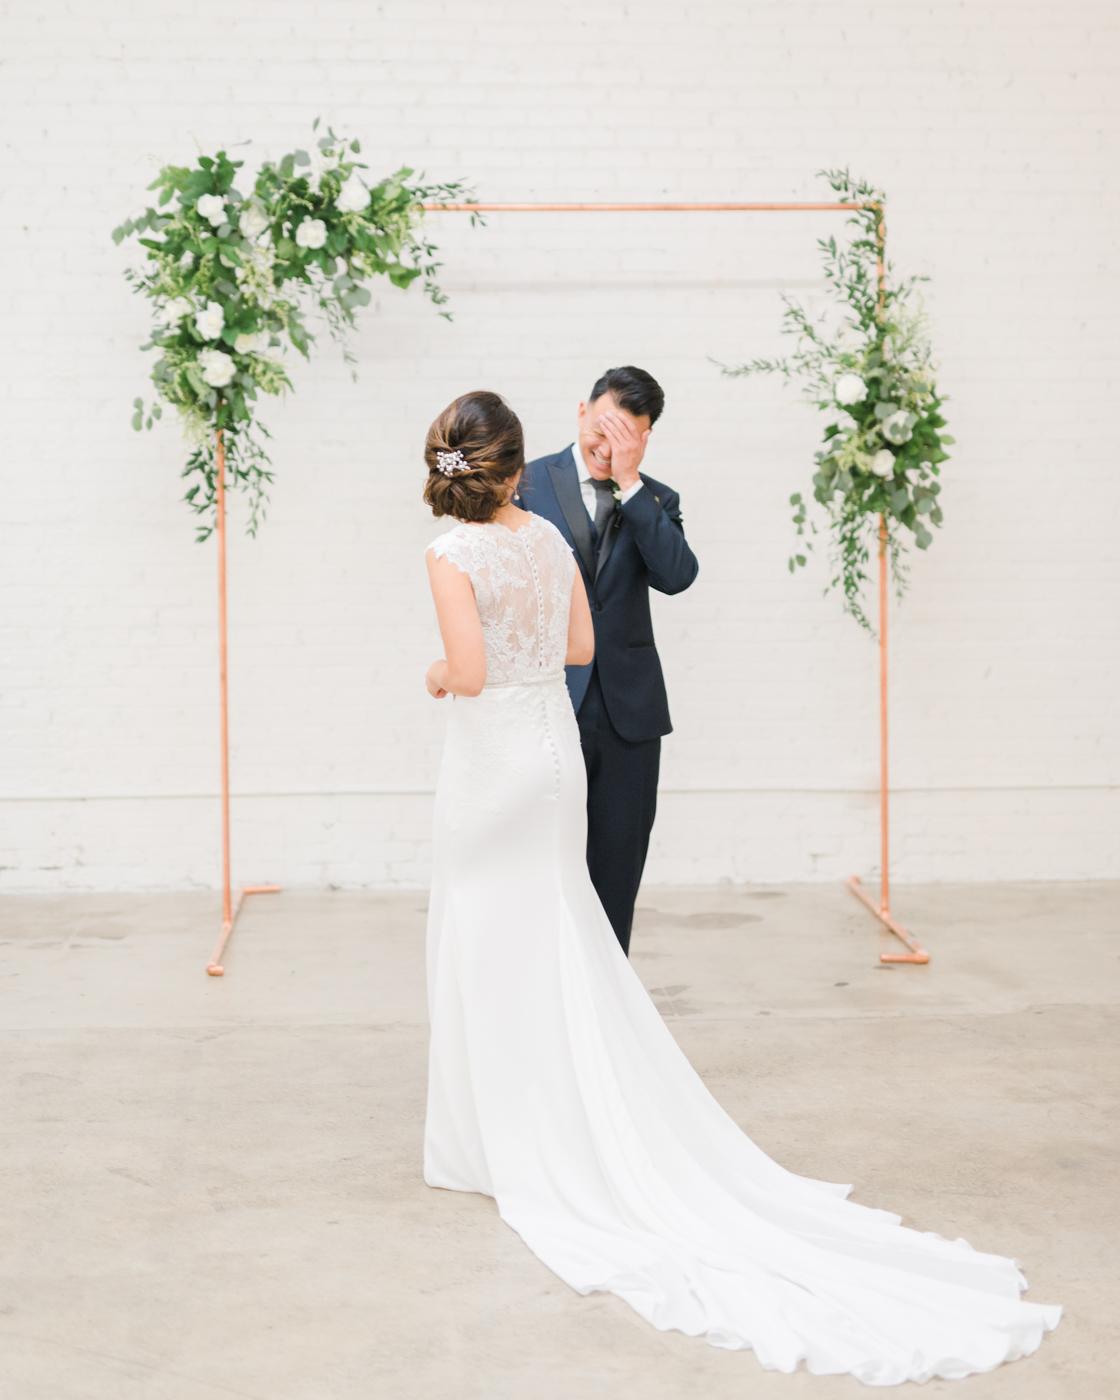 Modern_Wedding_HNYPT_Honeypot_LA_Photographer_Los_Angeles-6.jpg